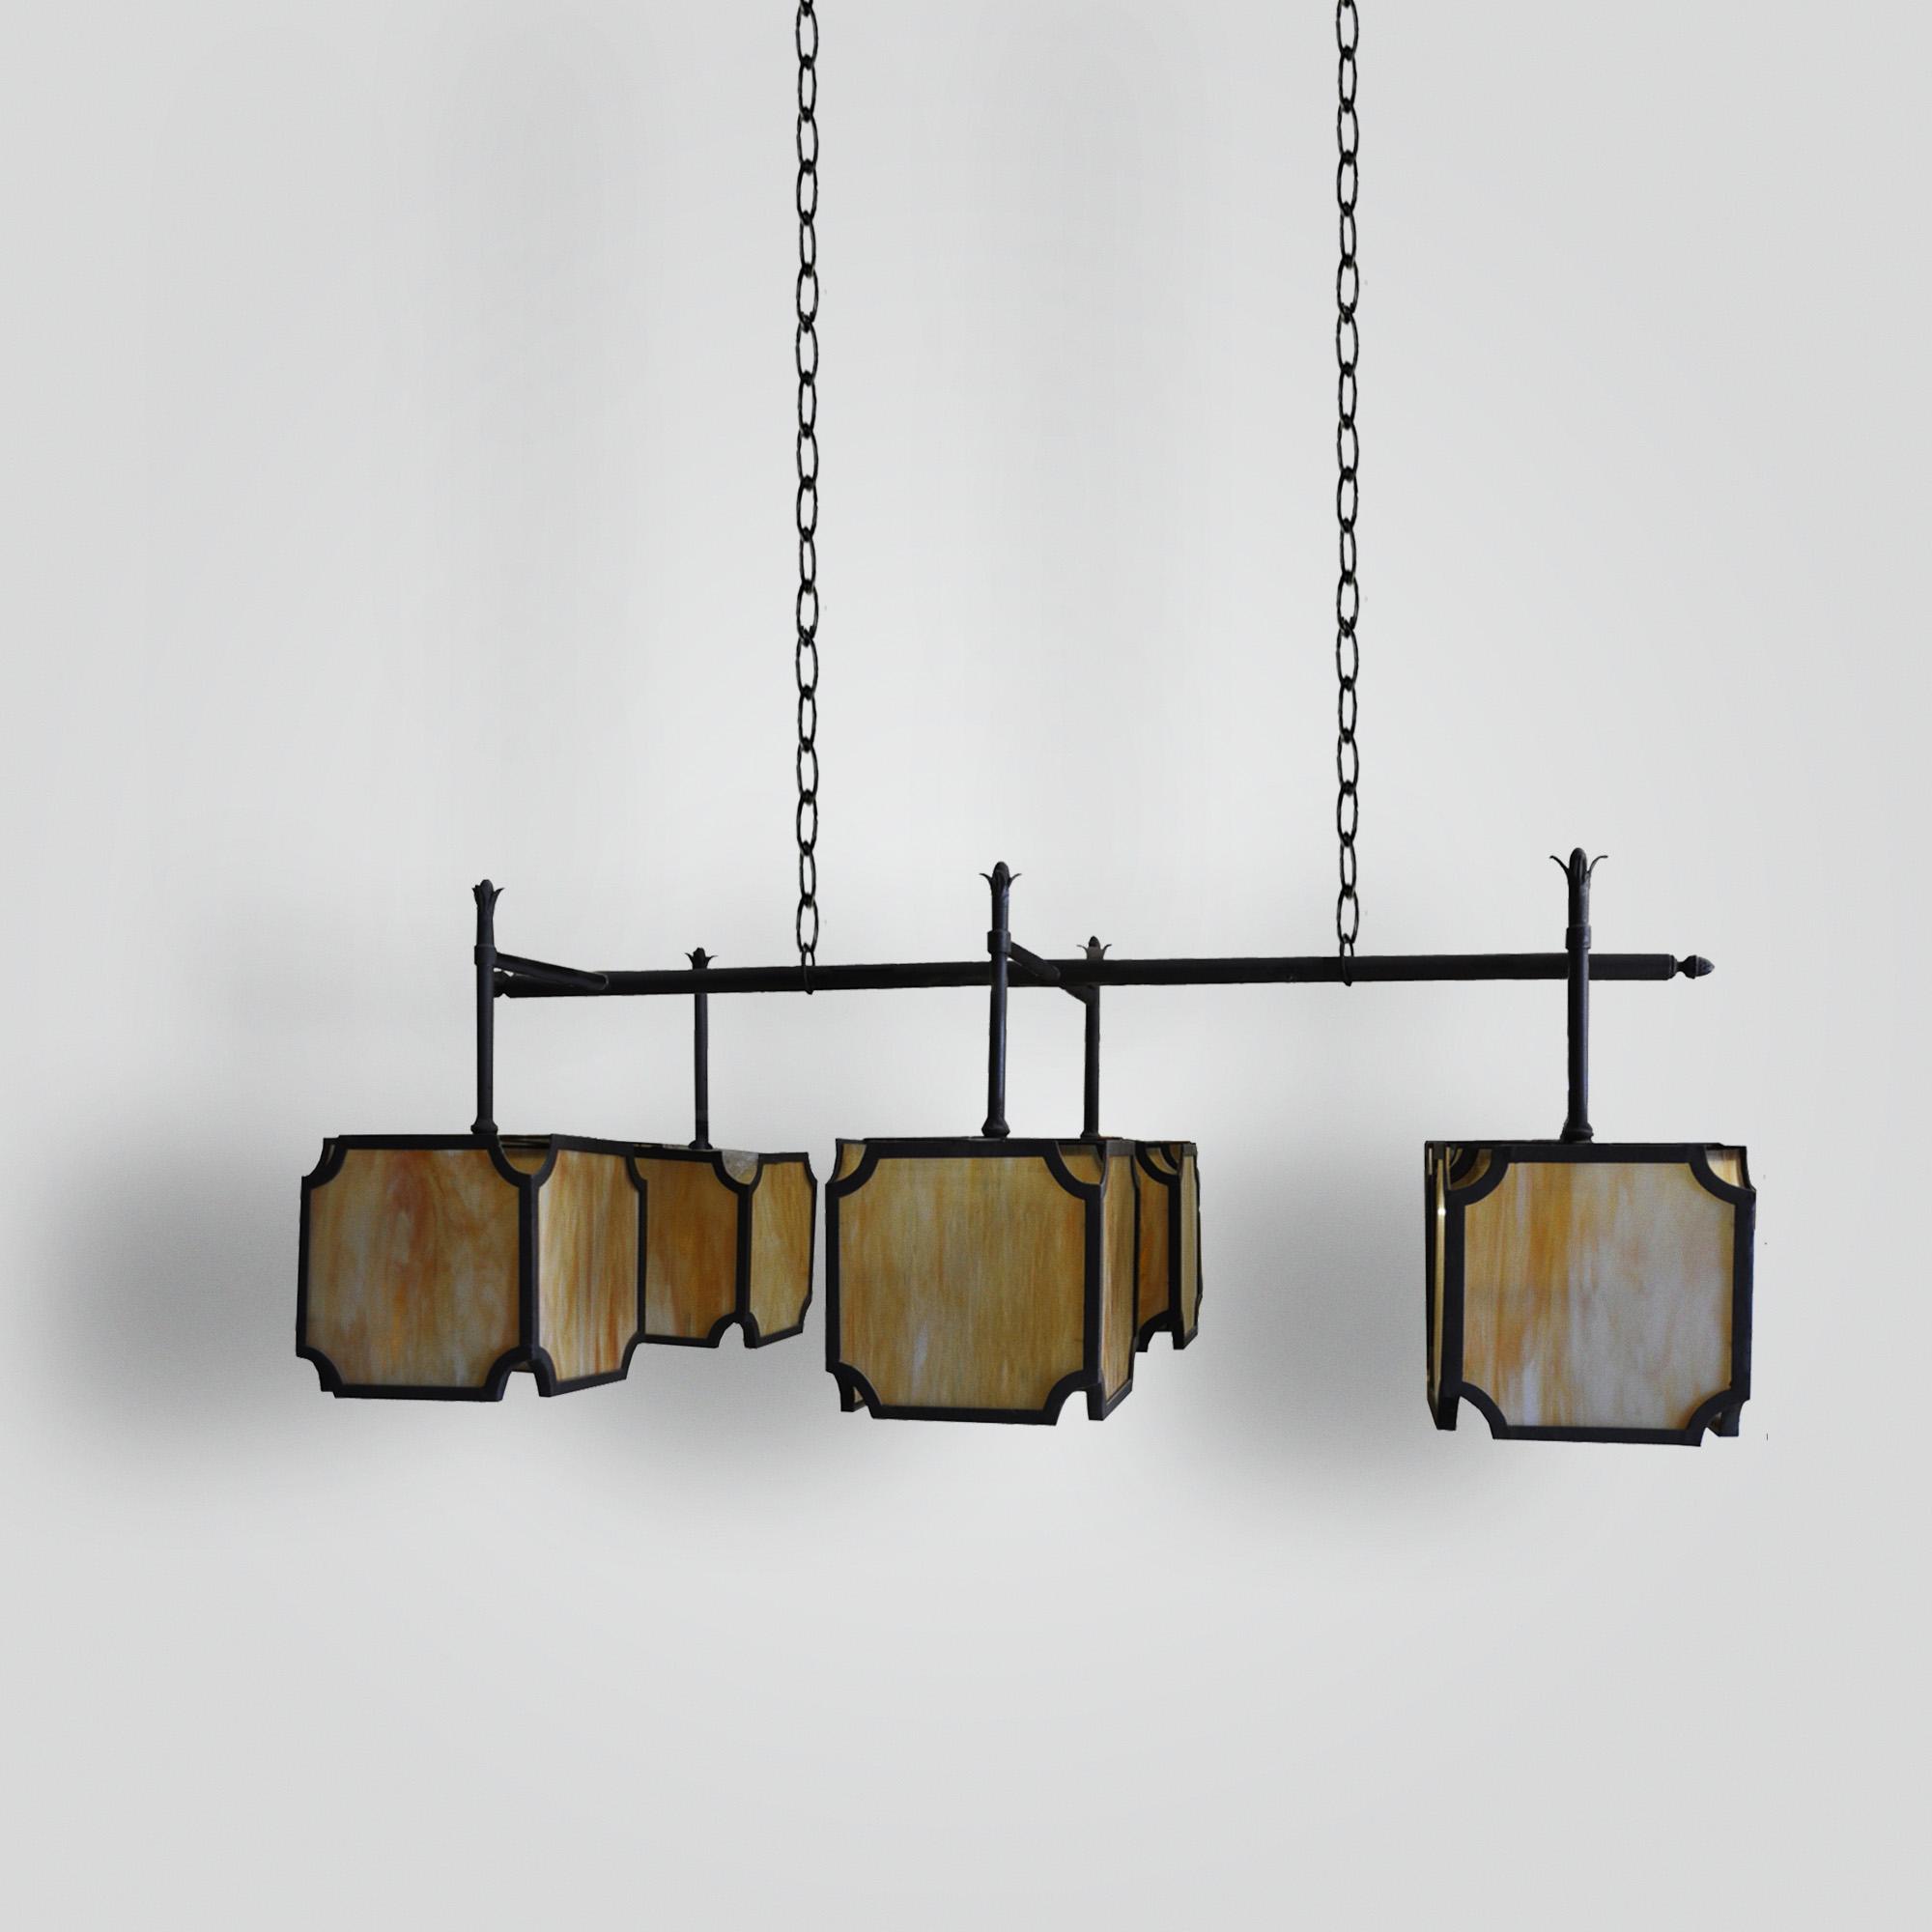 7060-mb6-ir-h-fr-large-northern-light – ADG Lighting Collection